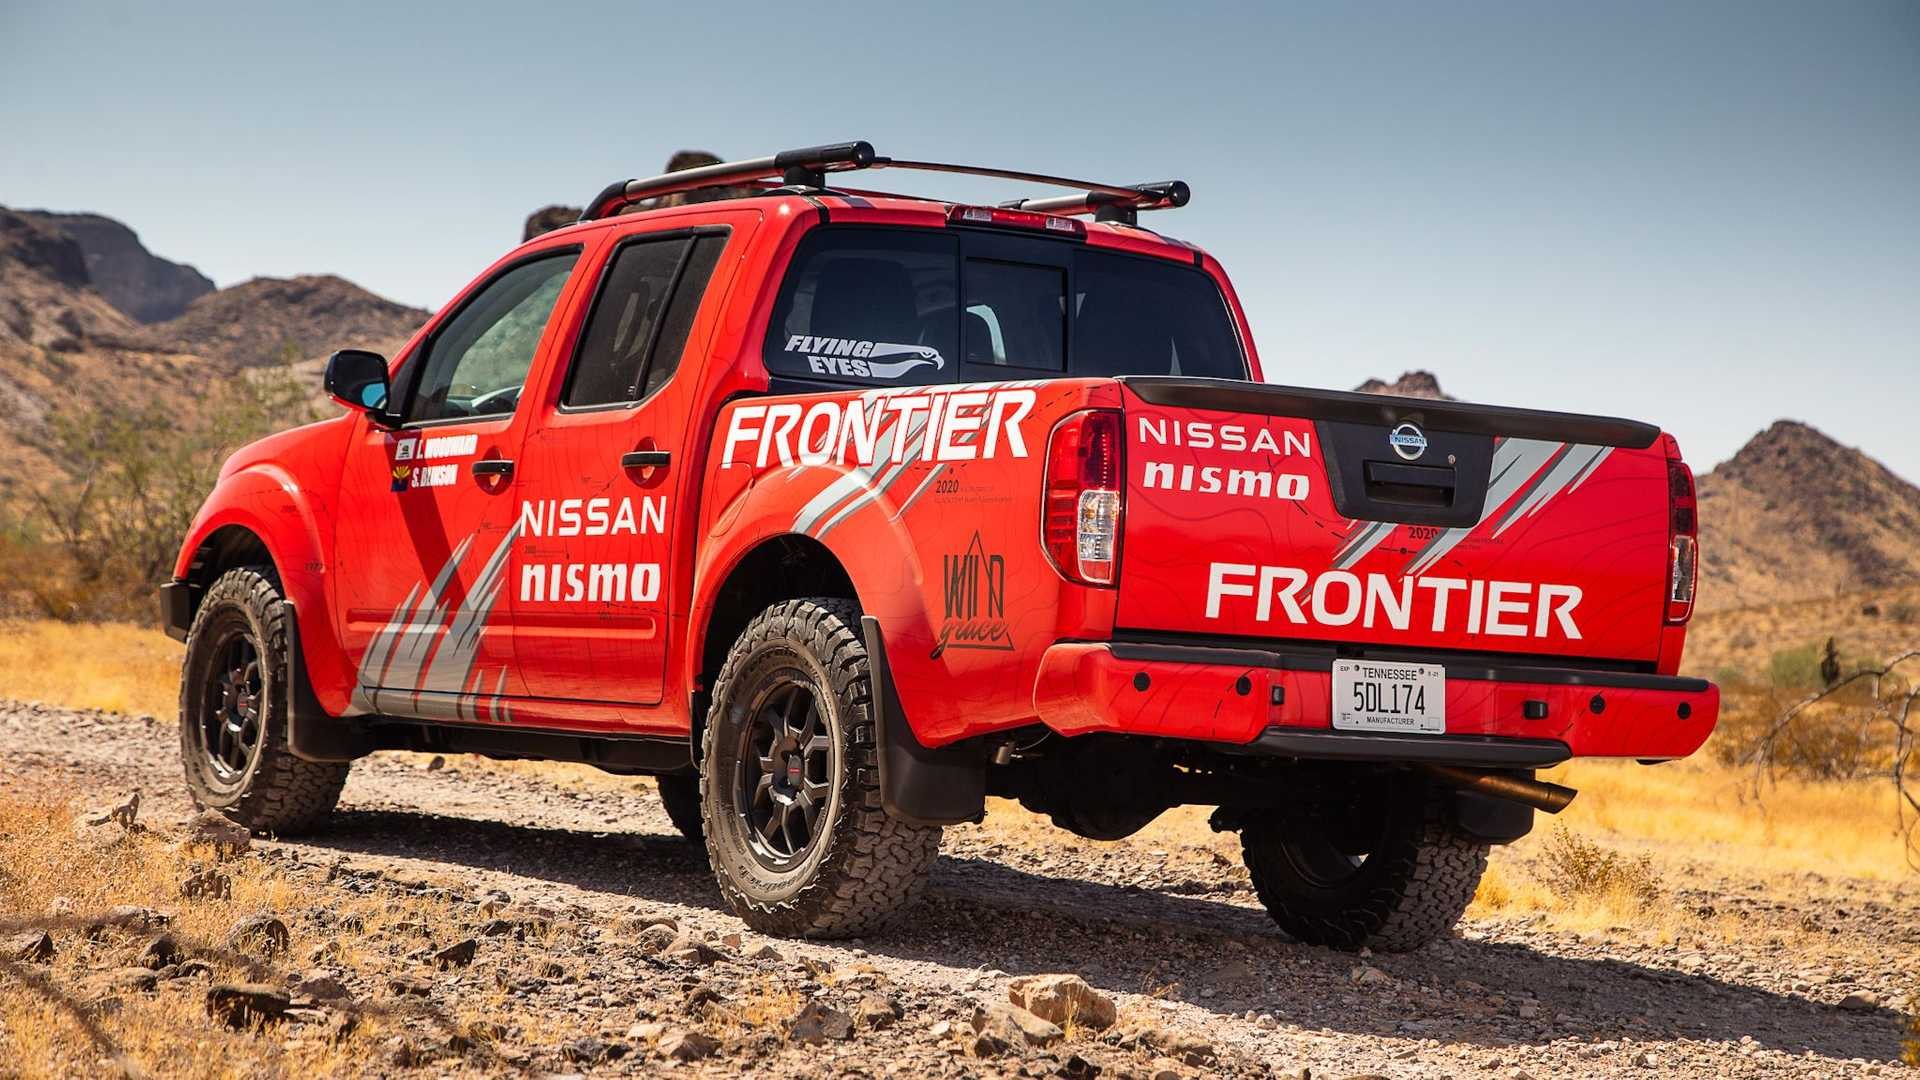 2020-nissan-frontier-bumper-nismo-11